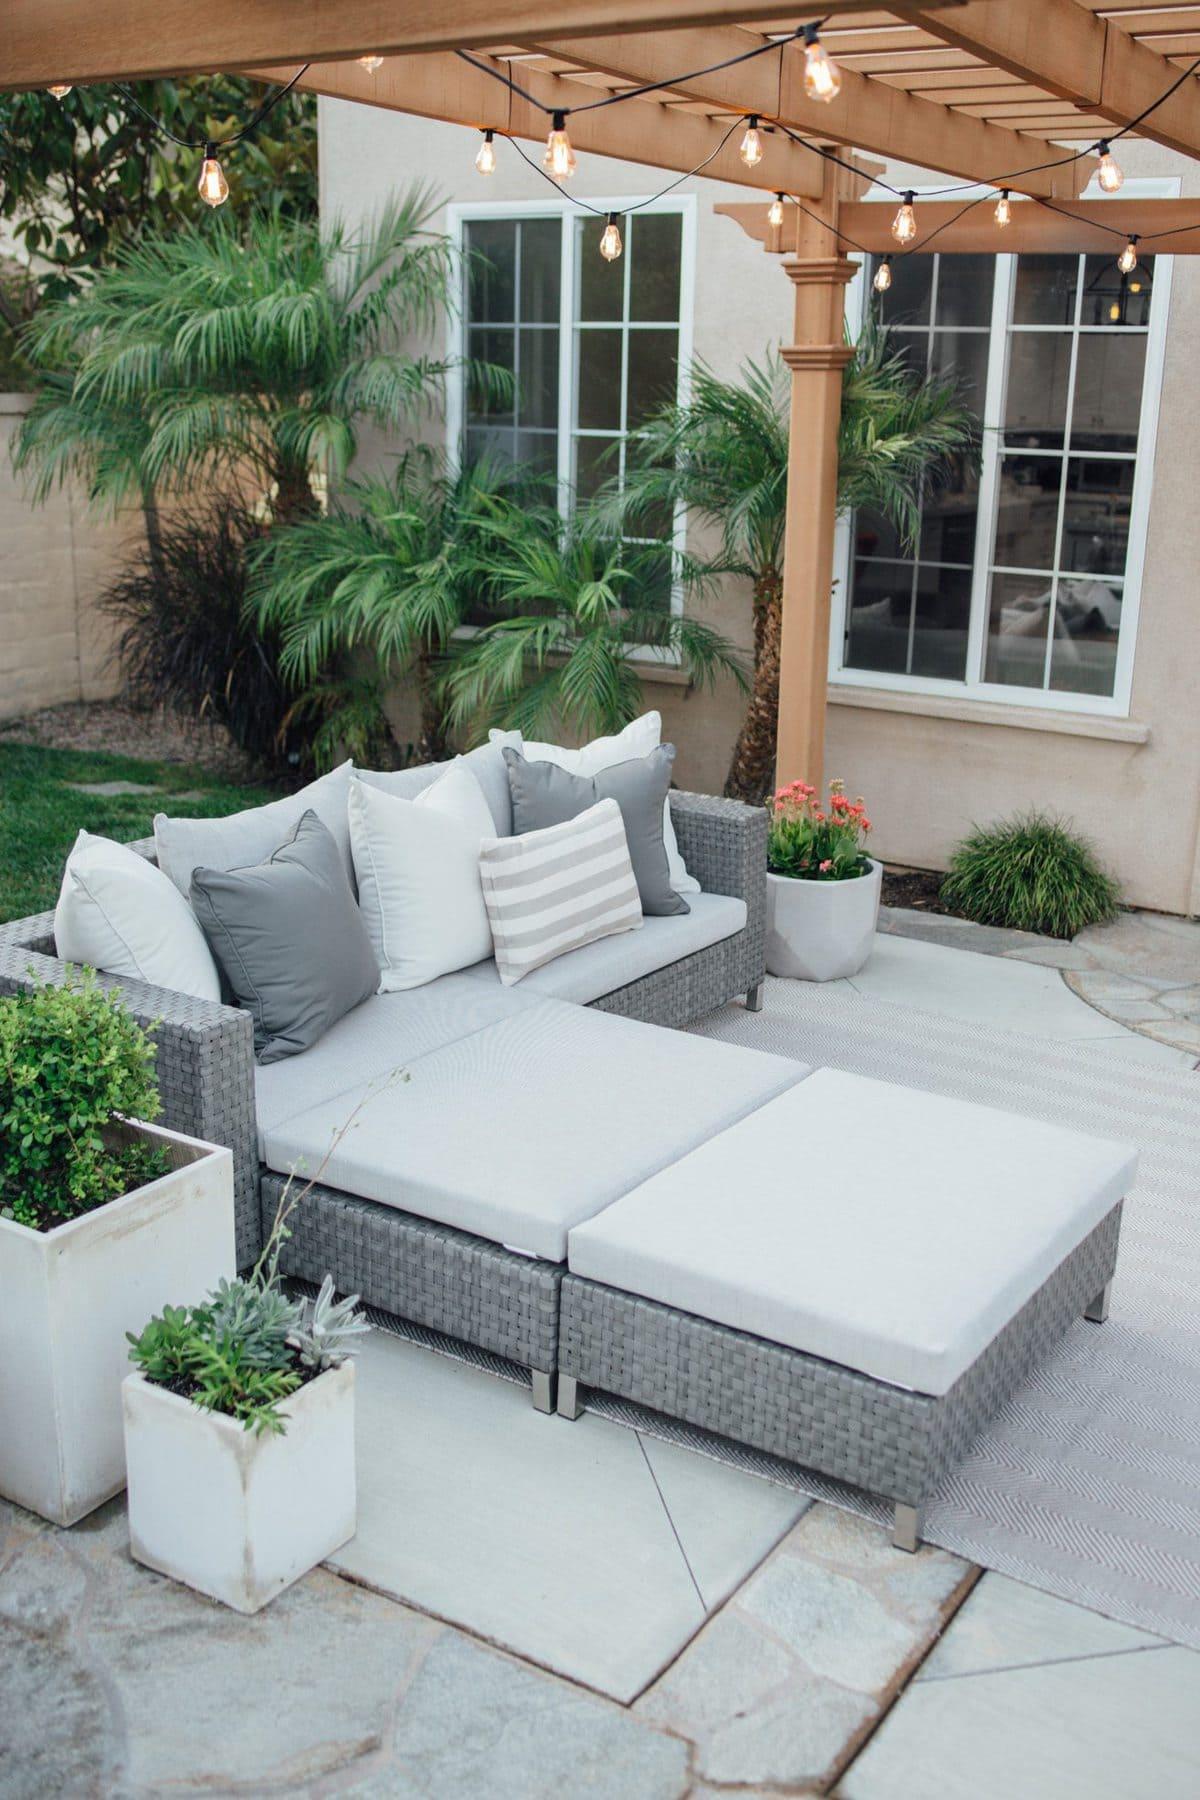 resized for sale backyard hayneedle outdoor mint reveal huge arrow furniture patio